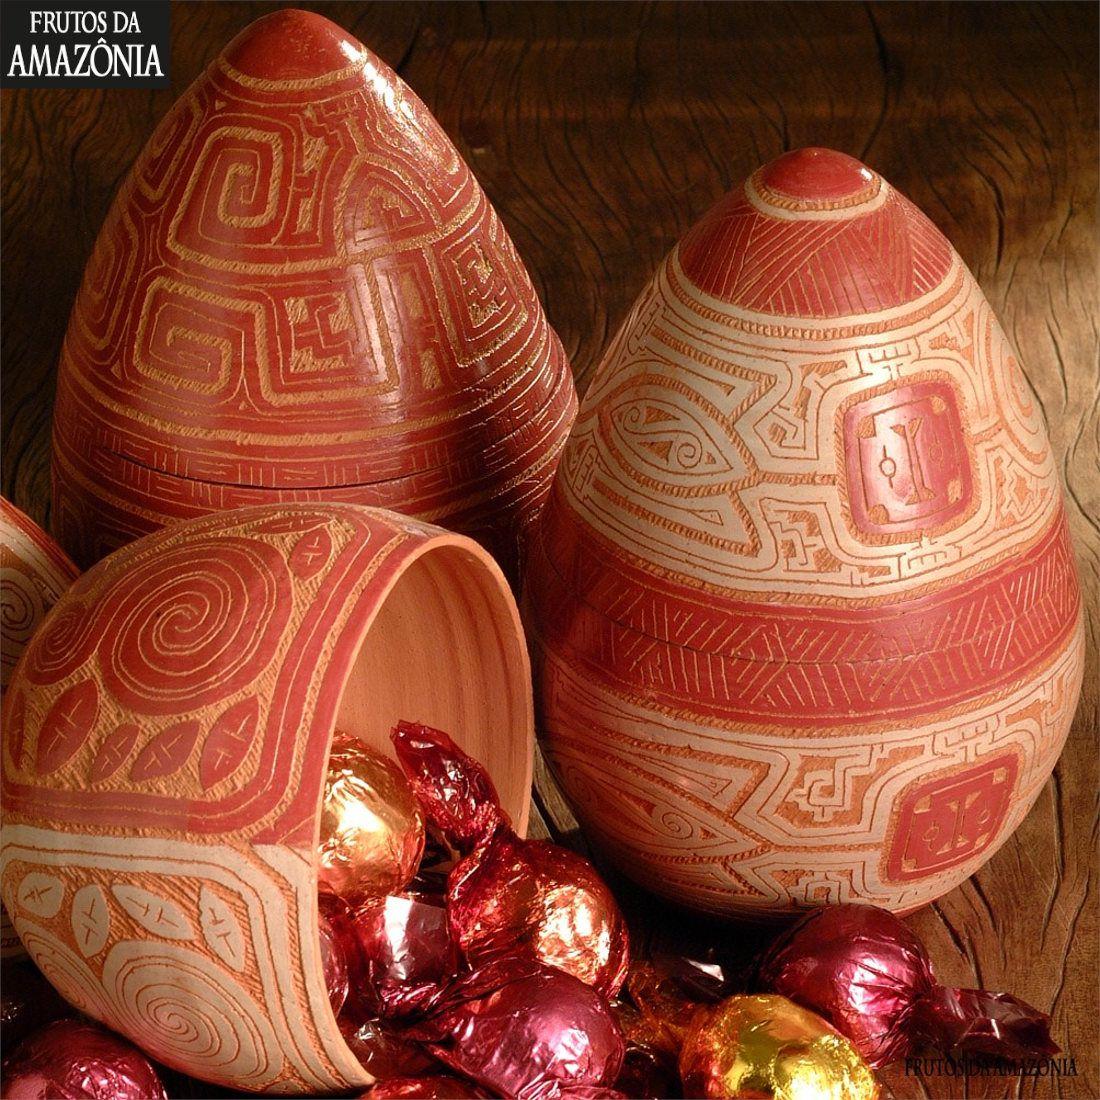 Ovo de Cerâmica marajoara com bombons - 210gr